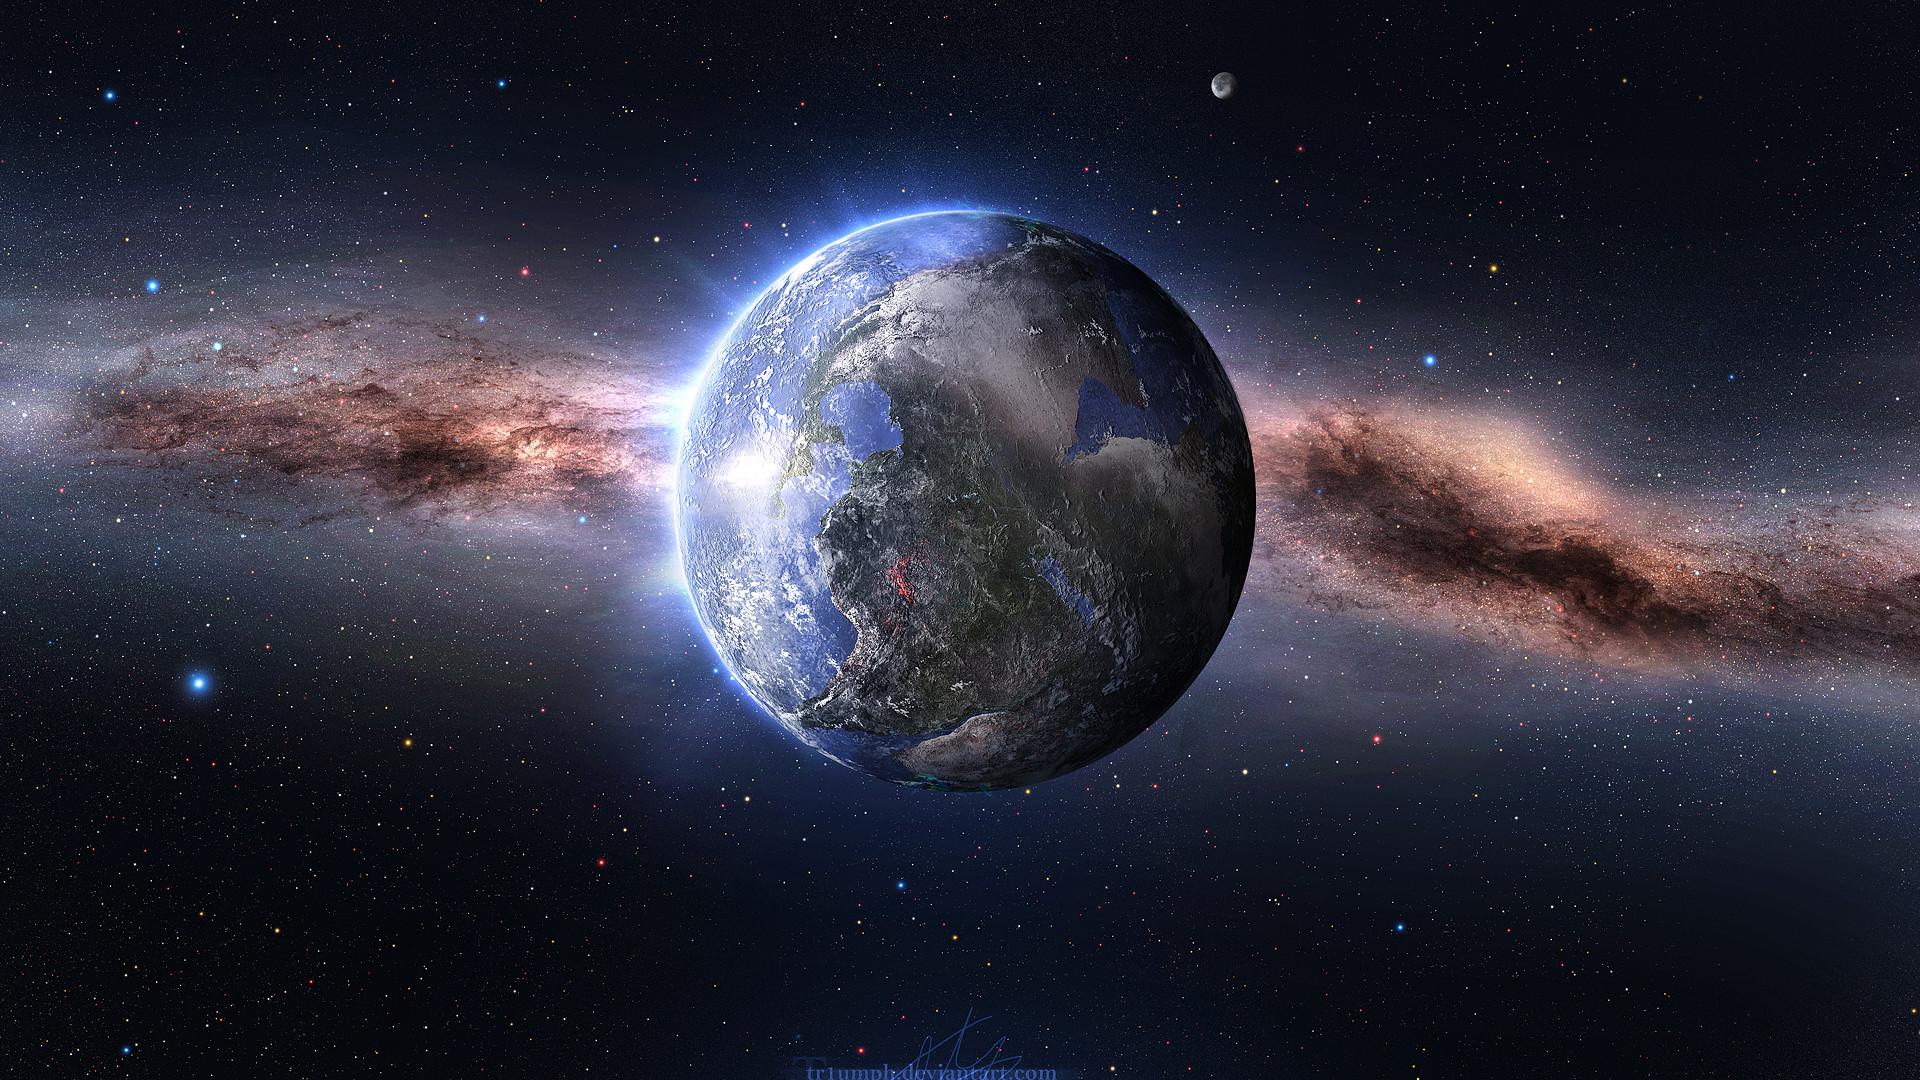 Space Nebula HD Desktop Wallpaper | WallpaperCow.com